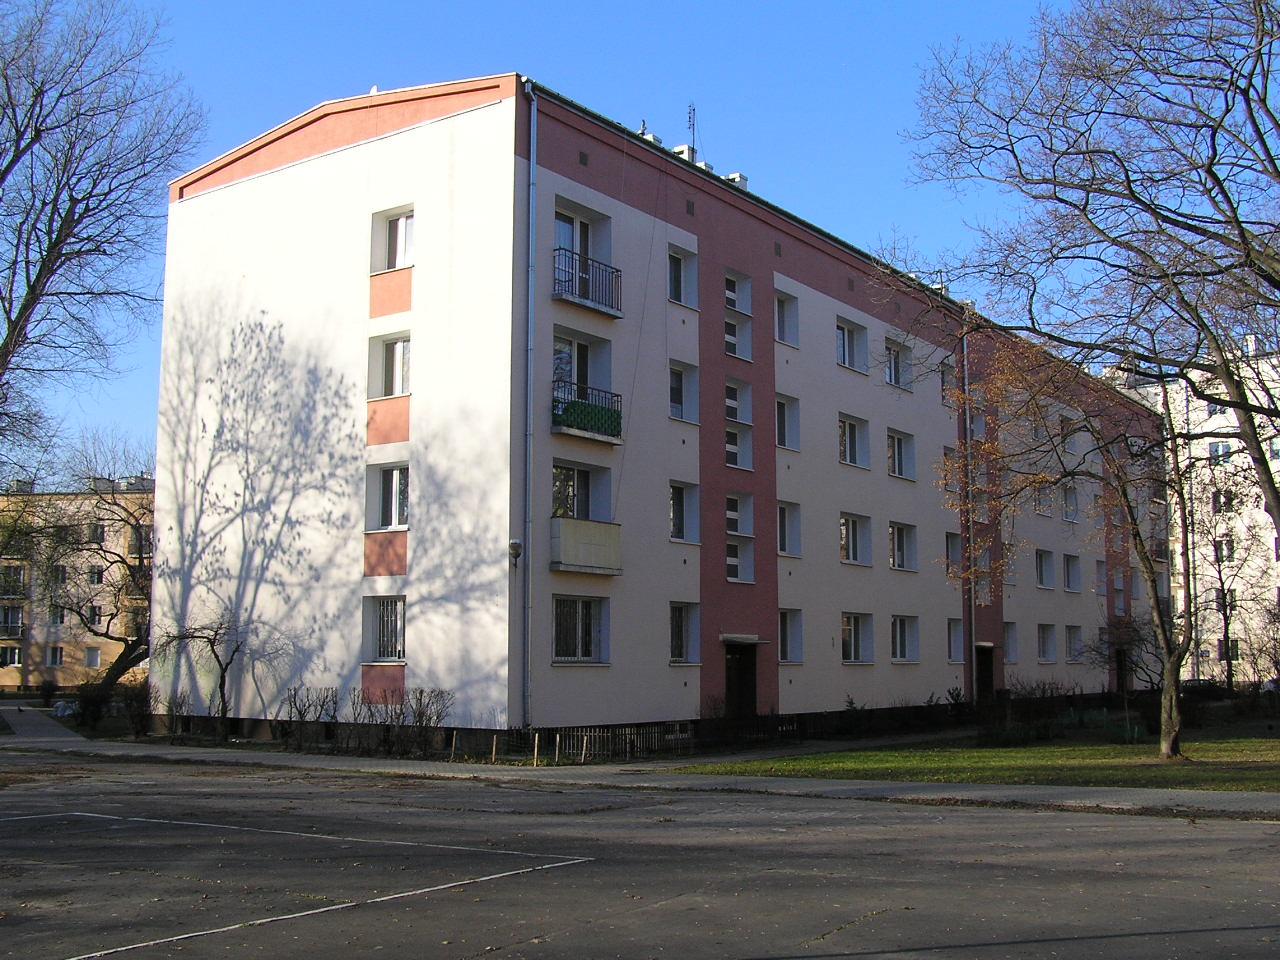 Kirasjerów 6